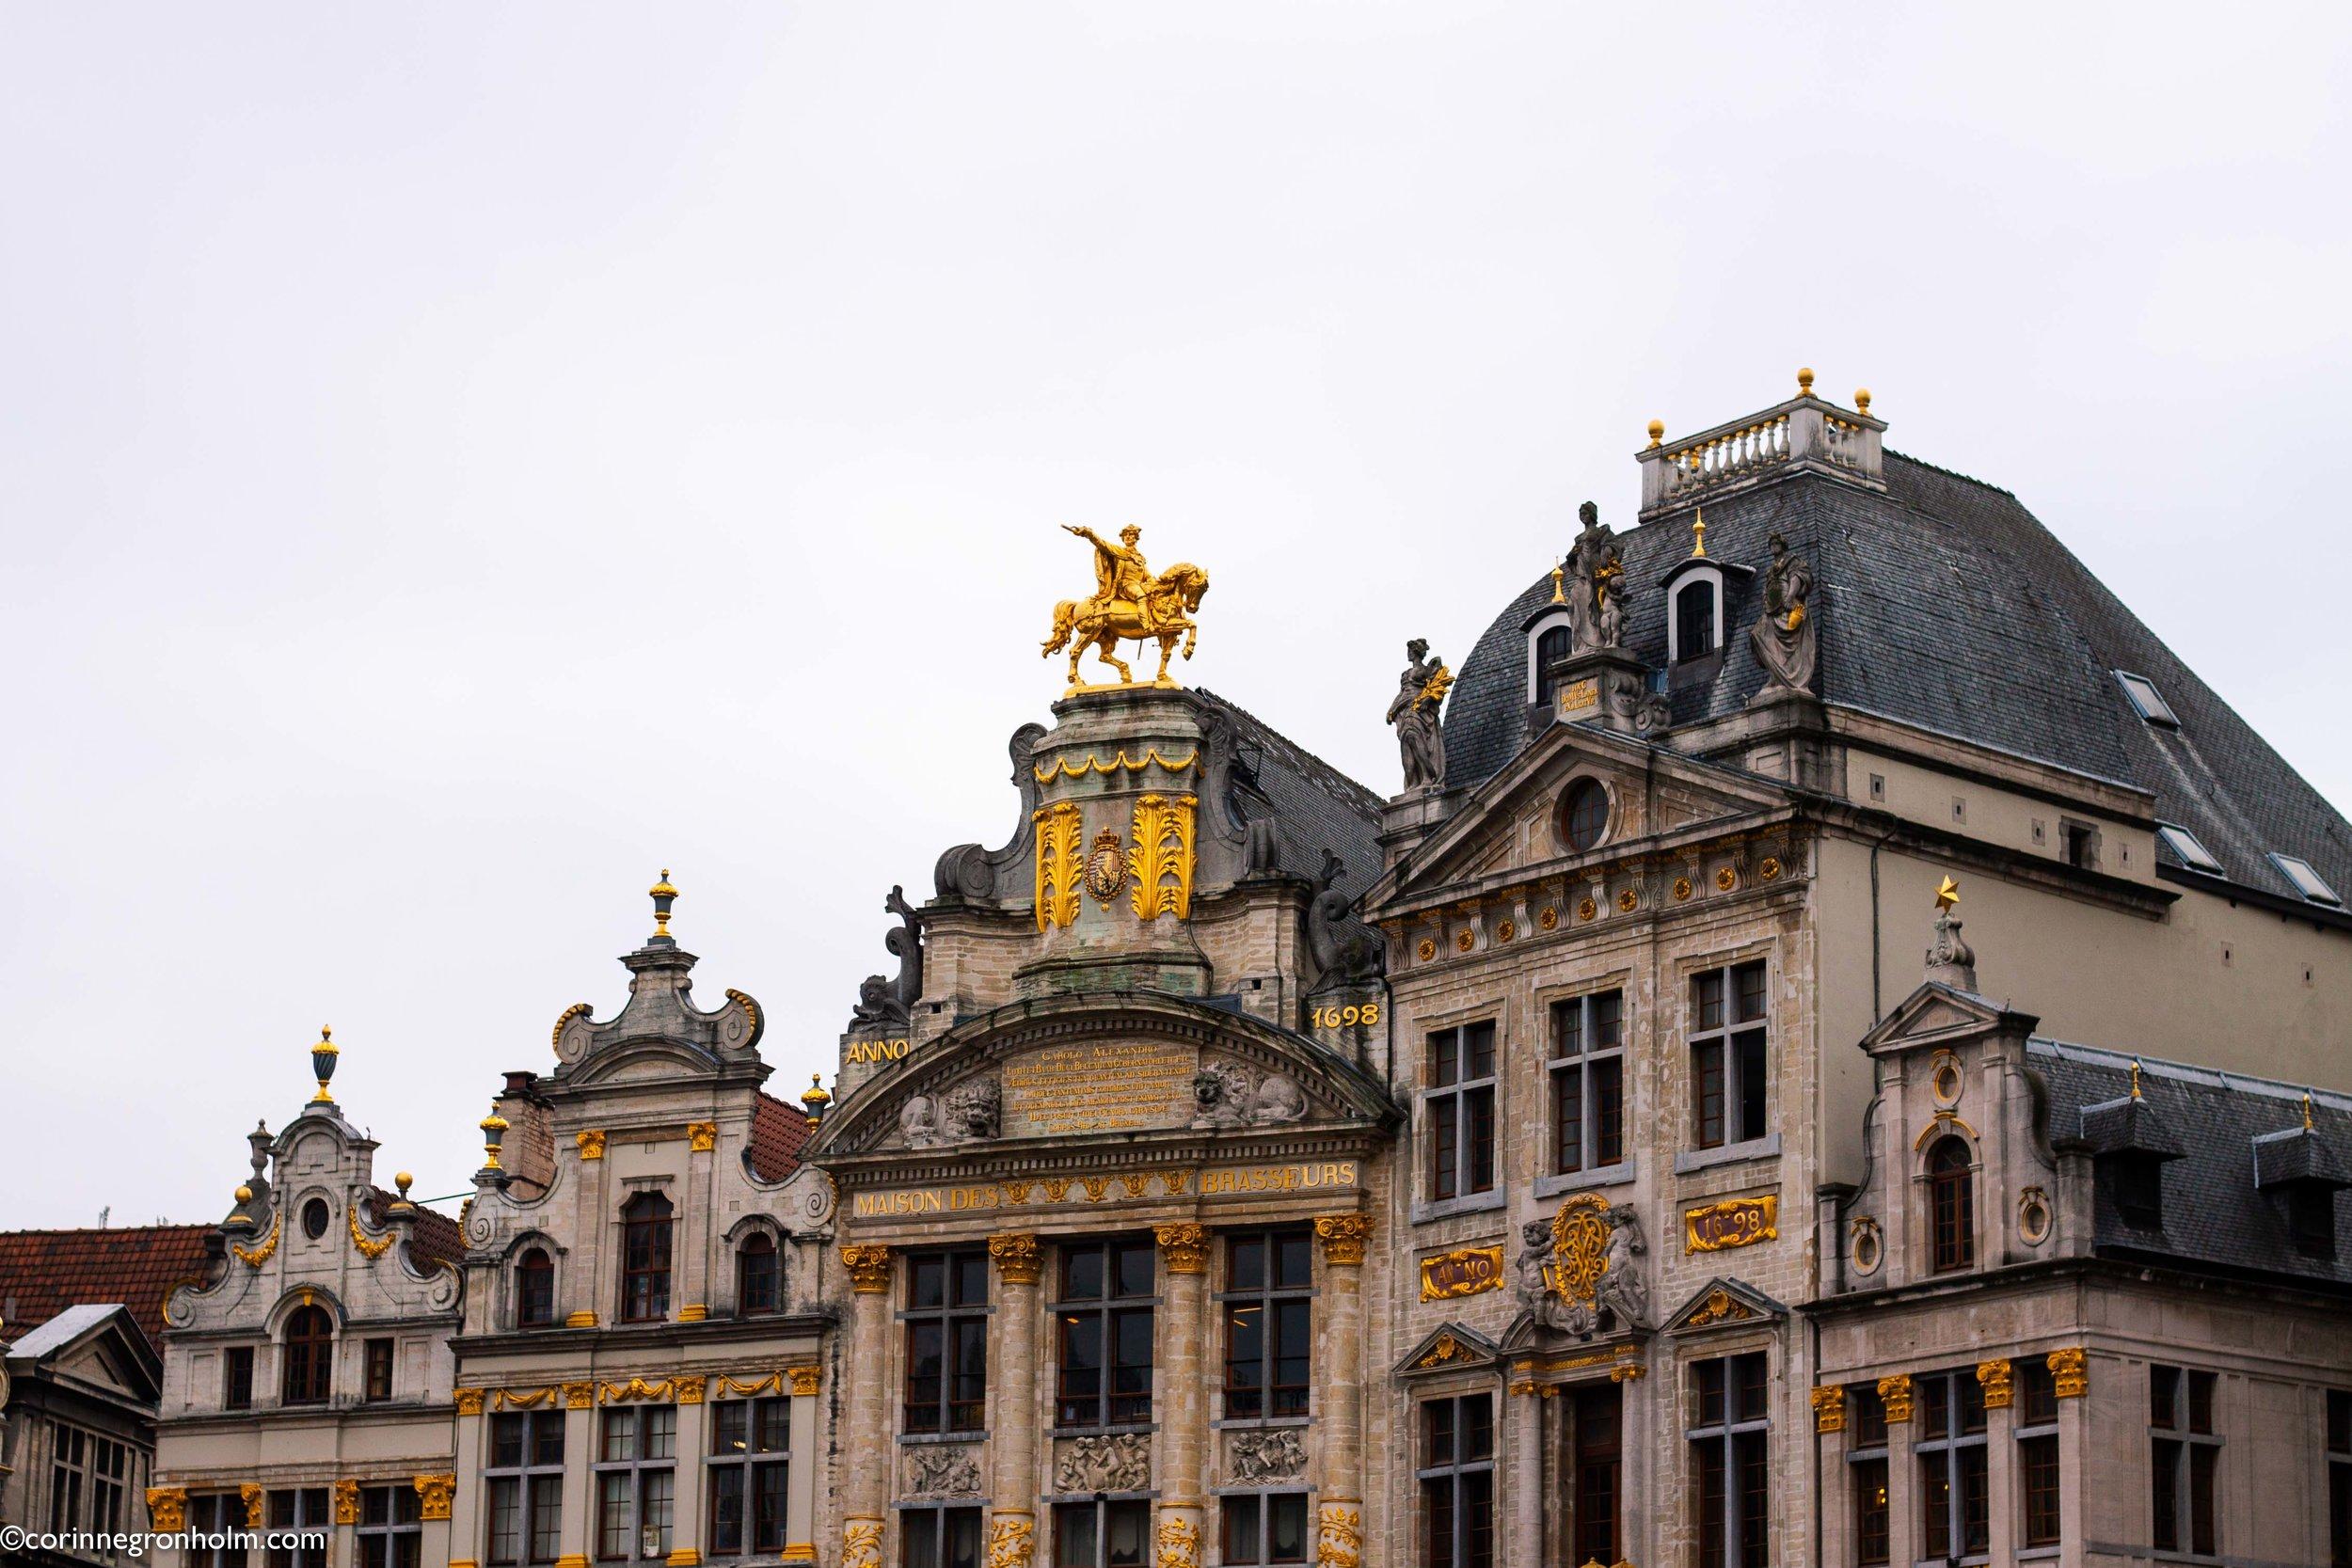 bryssel.jpg